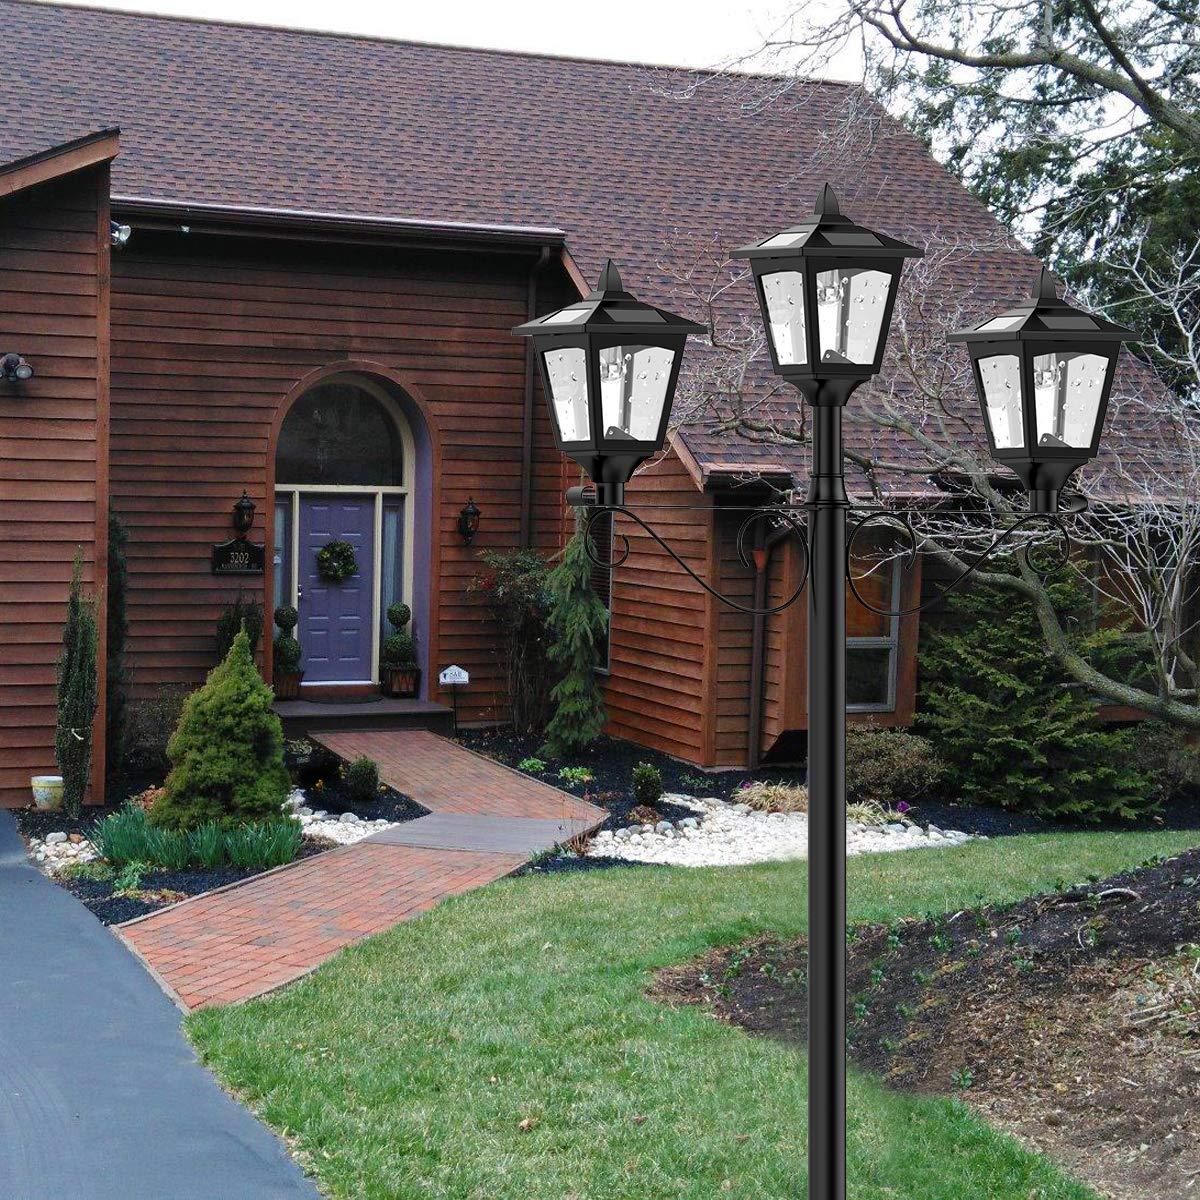 Planter Not Included Greluna 72 Solar Lamp Post Lights Outdoor Lawn Solar Post Light for Garden Triple-Head Street Vintage Solar Lamp Outdoor